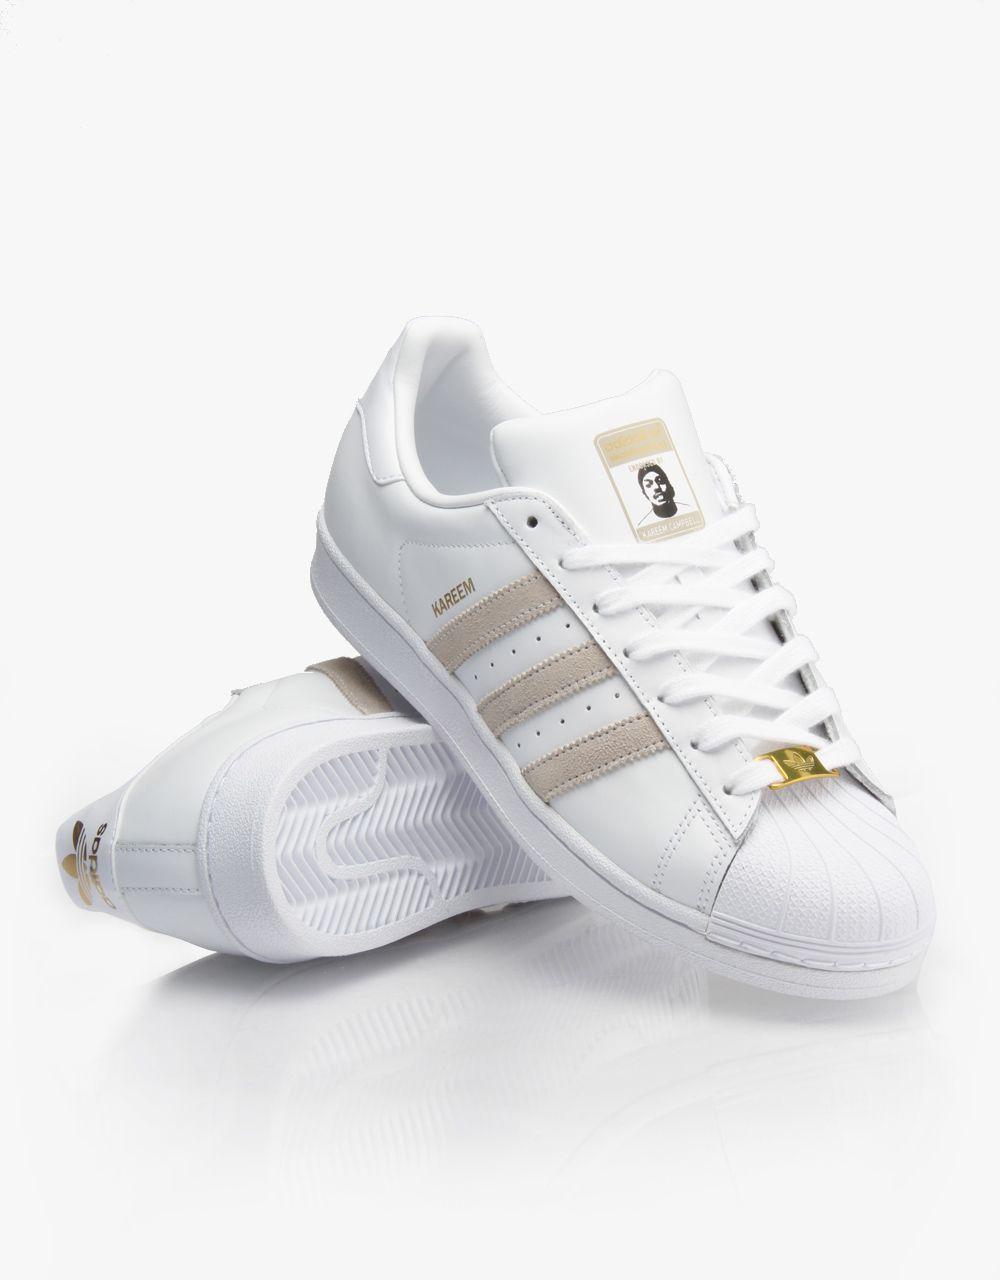 adidas #superstar #kareem #campbell | Sneaker stiefel